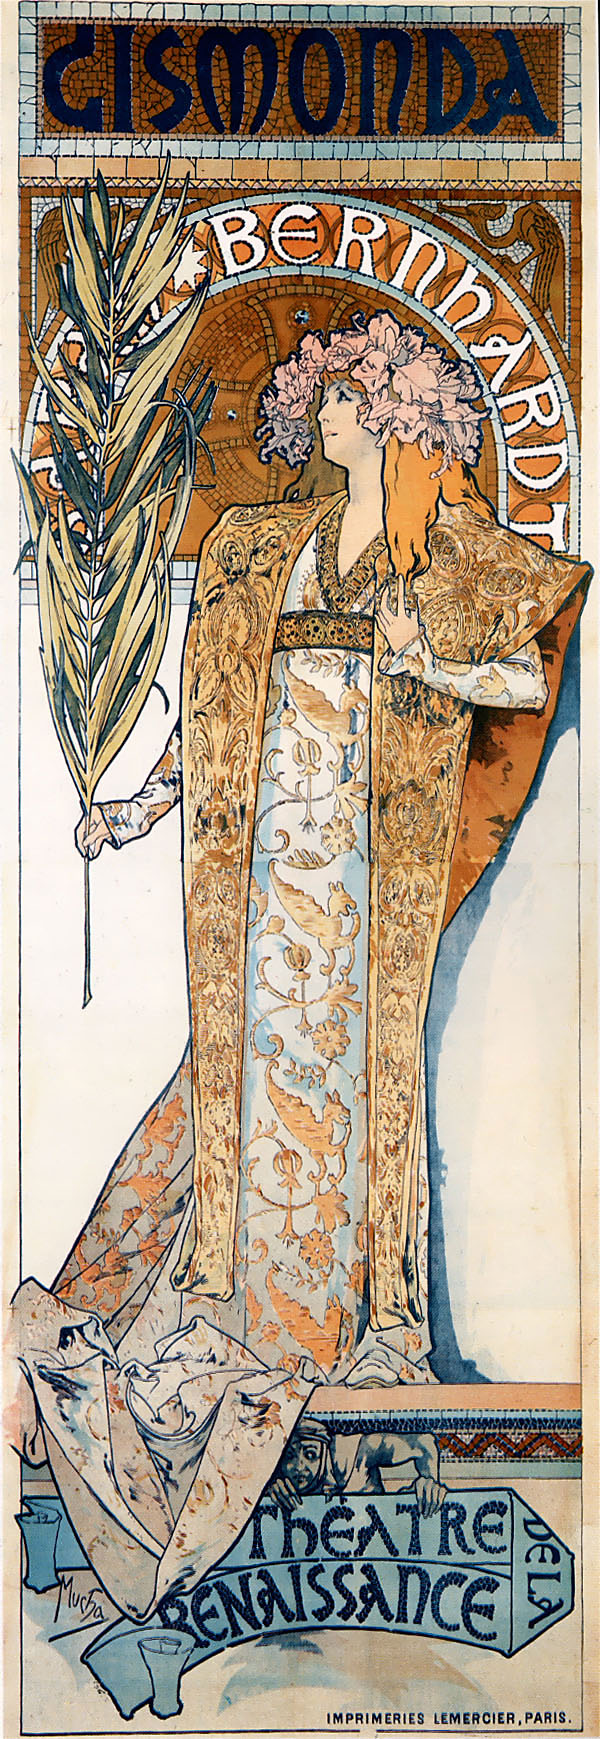 Mucha Do About Art Nouveau 5 Minute History